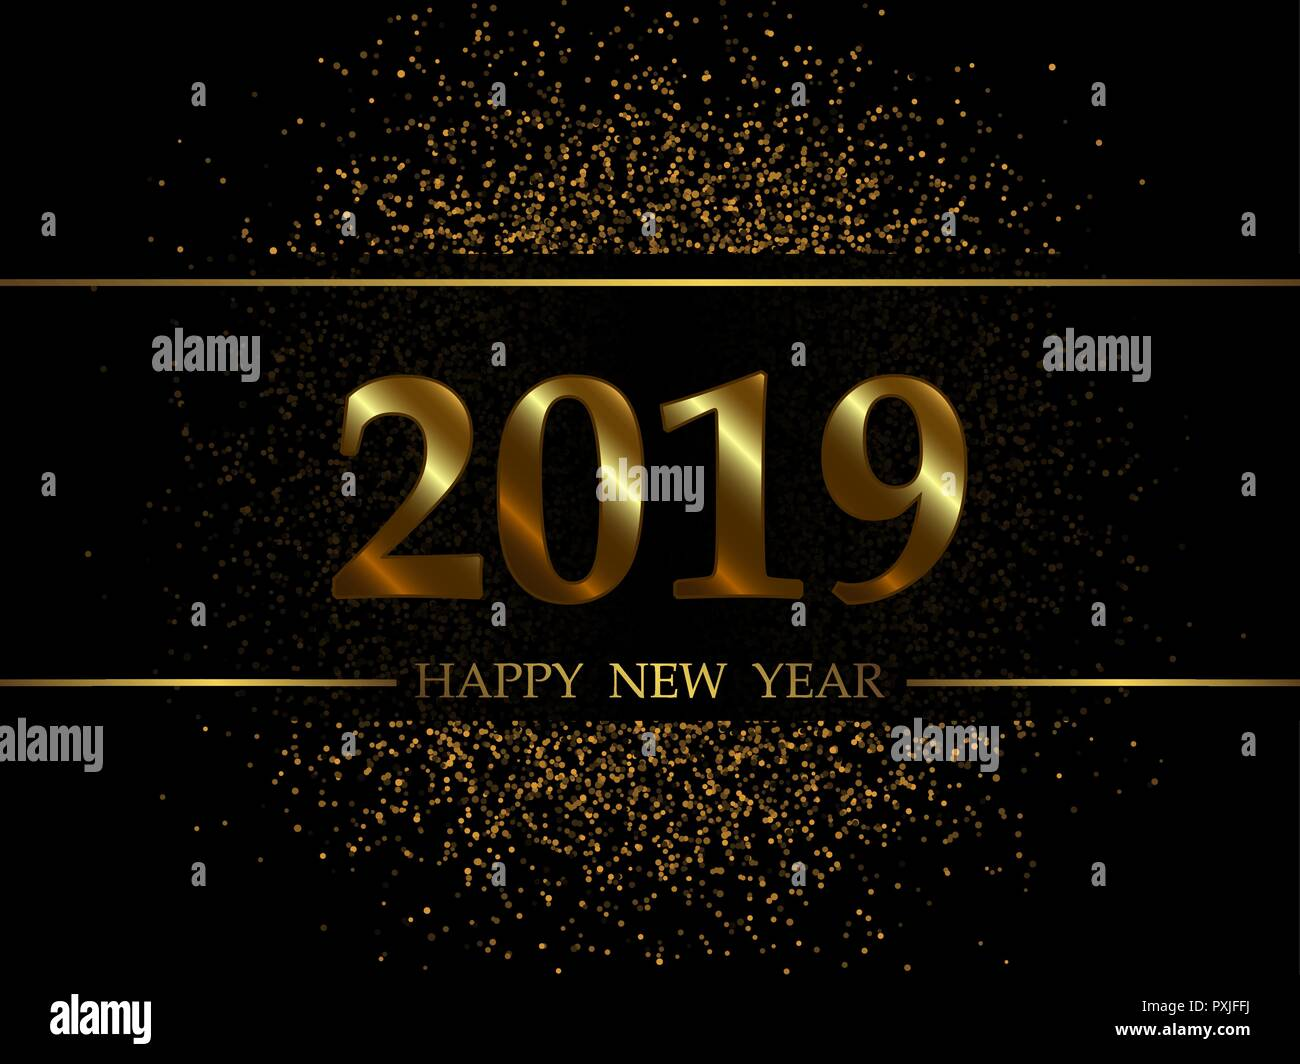 2019 new year black background with gold glitter confetti festive